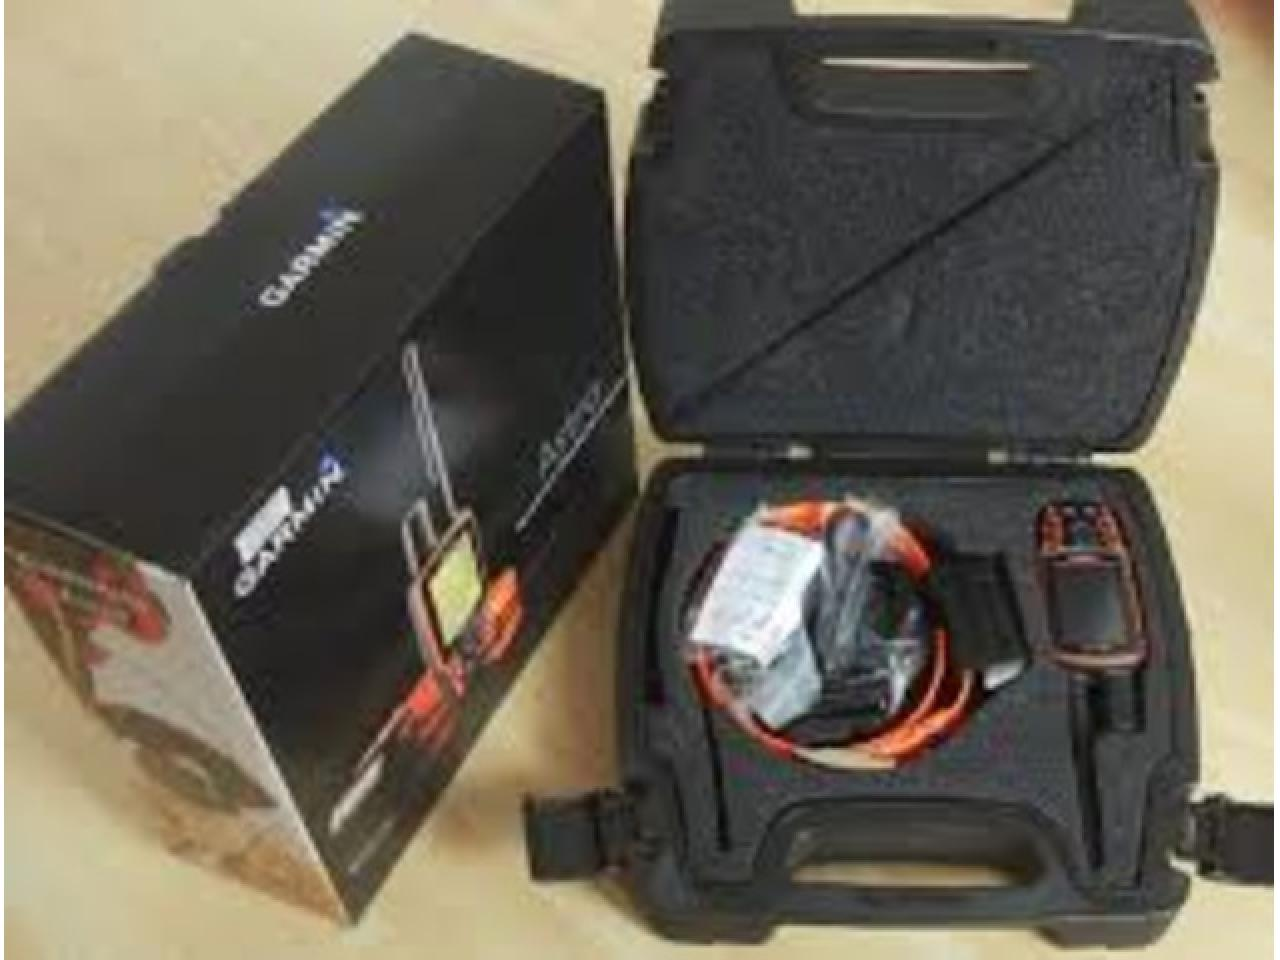 Garmin astro 320 / Alpha 100 / Sportdog Tek 2.0 Handheld с DC30.DC40 DC50 TT15 Ошейники ETC. - 2